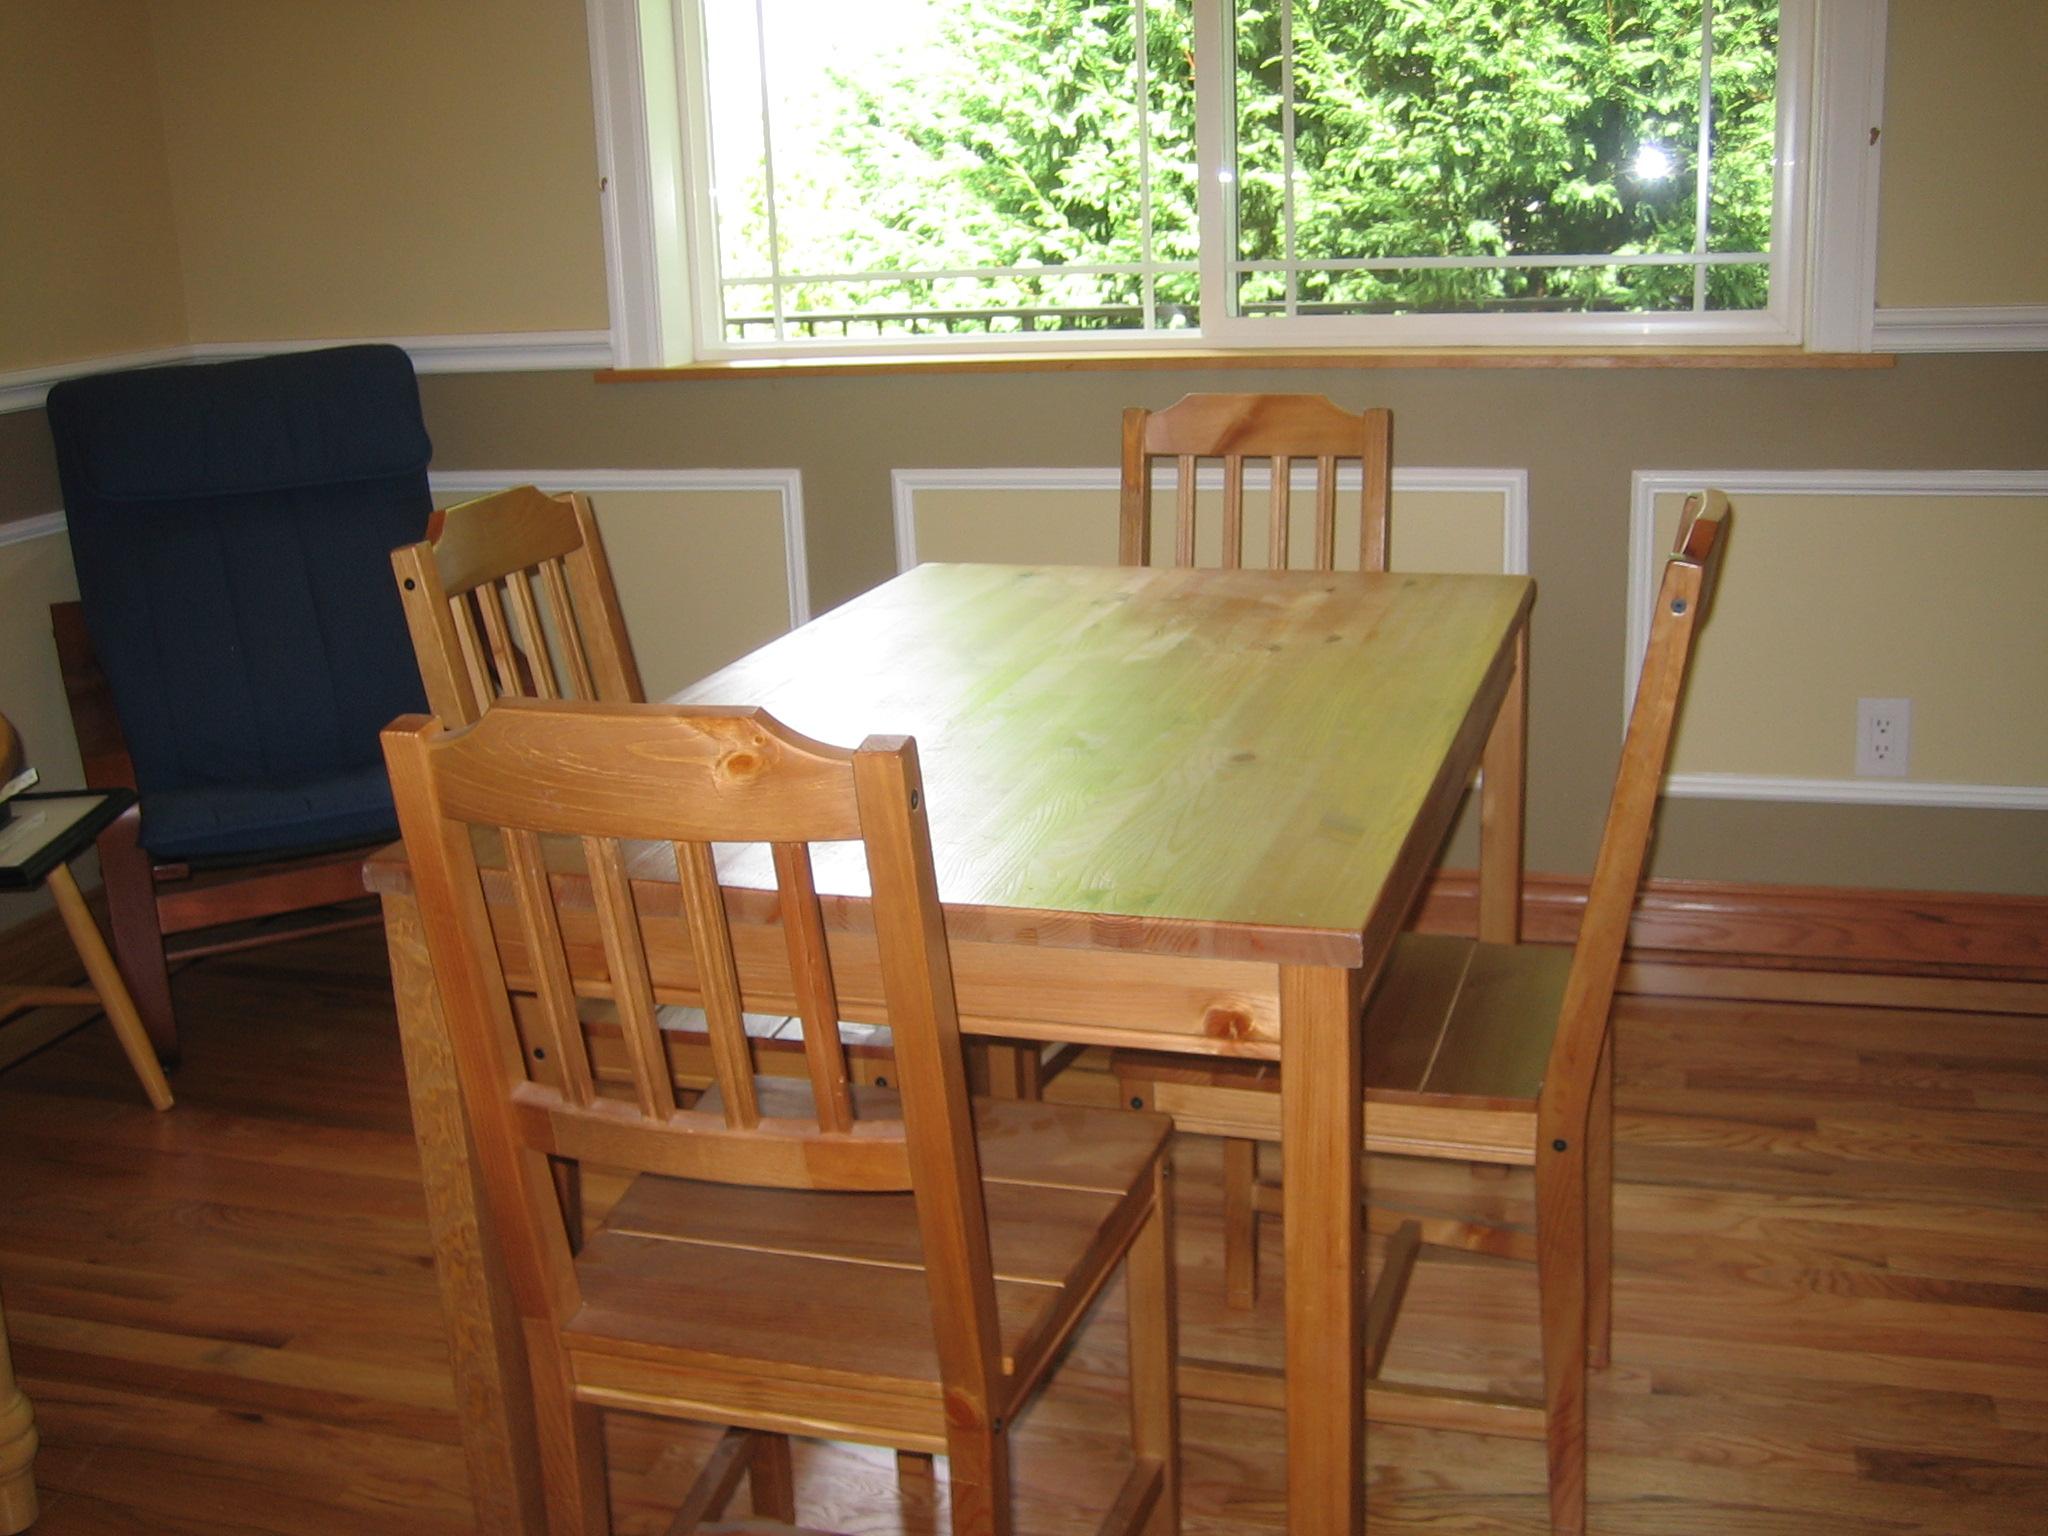 Kitchen bar table sets photo - 2